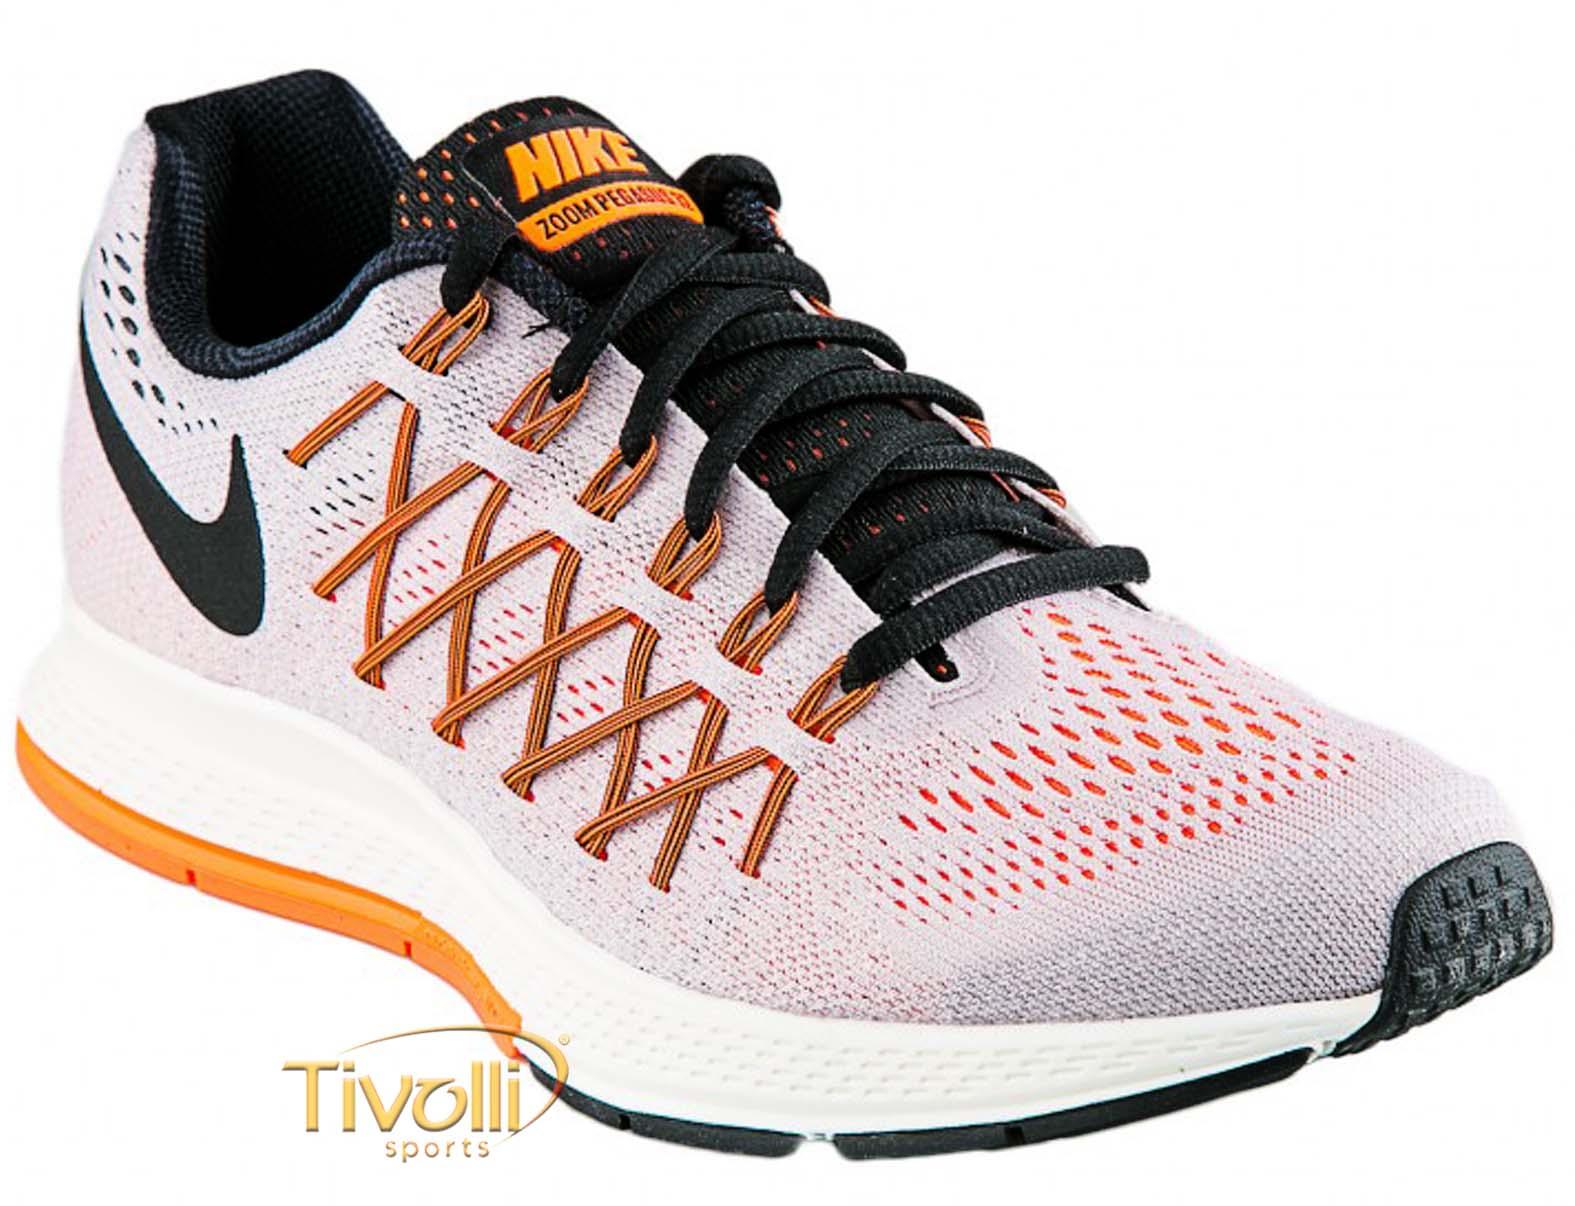 53967fa5d06c1 Raquete Mania   Tênis Nike Air Zoom Pegasus 32   cinza